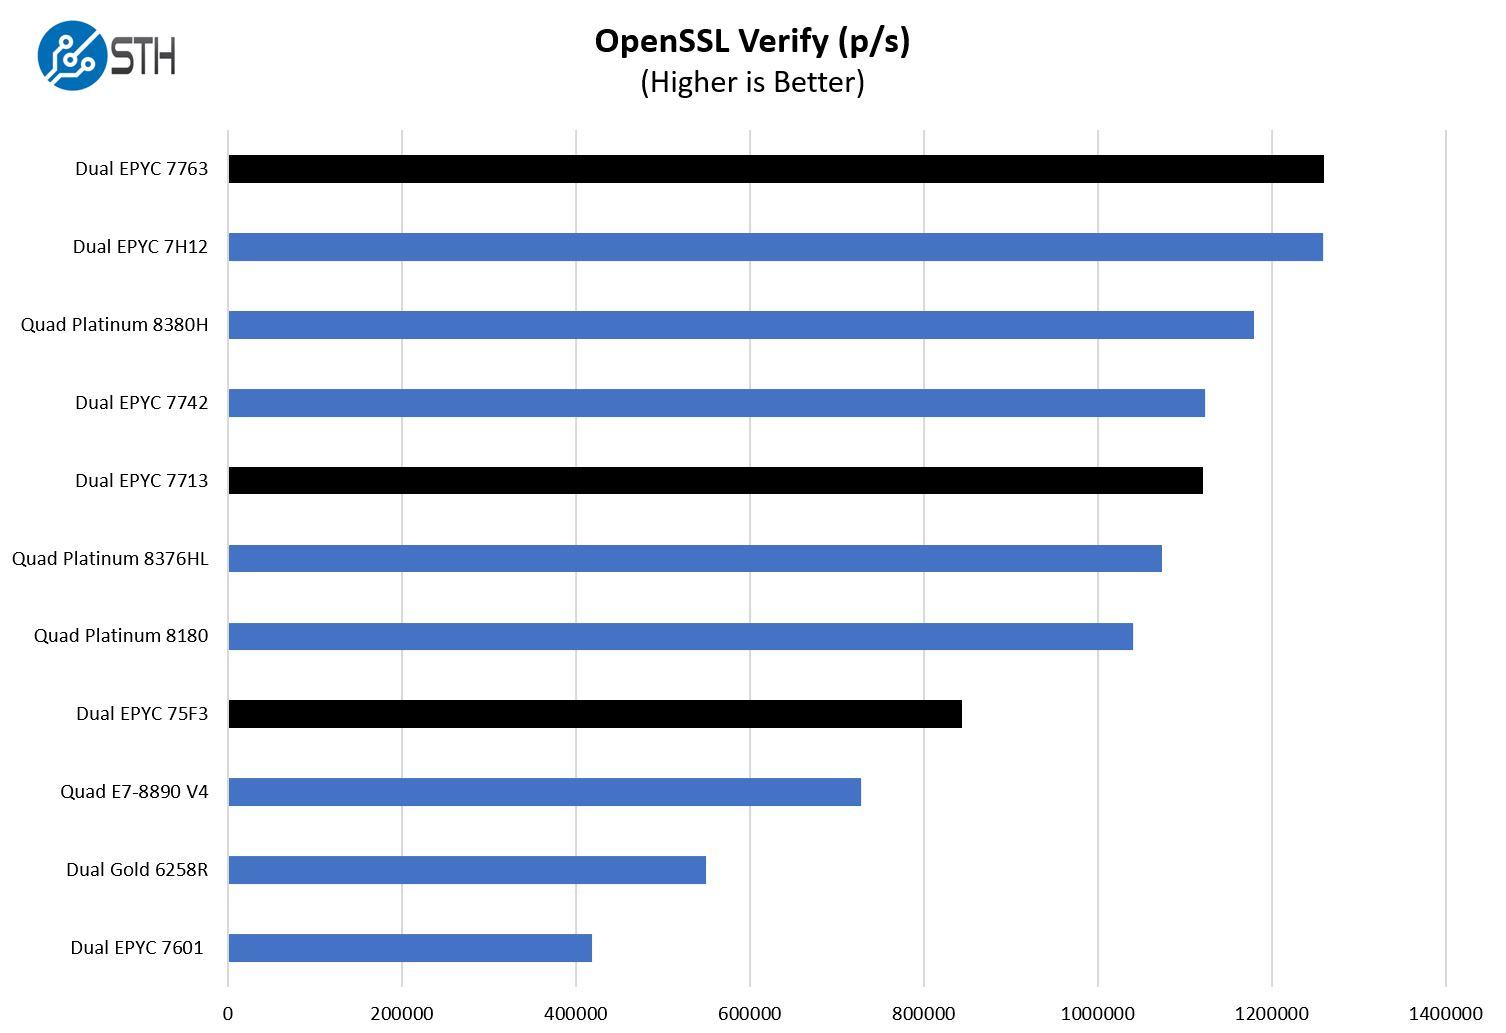 AMD EPYC 7003 High End OpenSSL Verify Performance